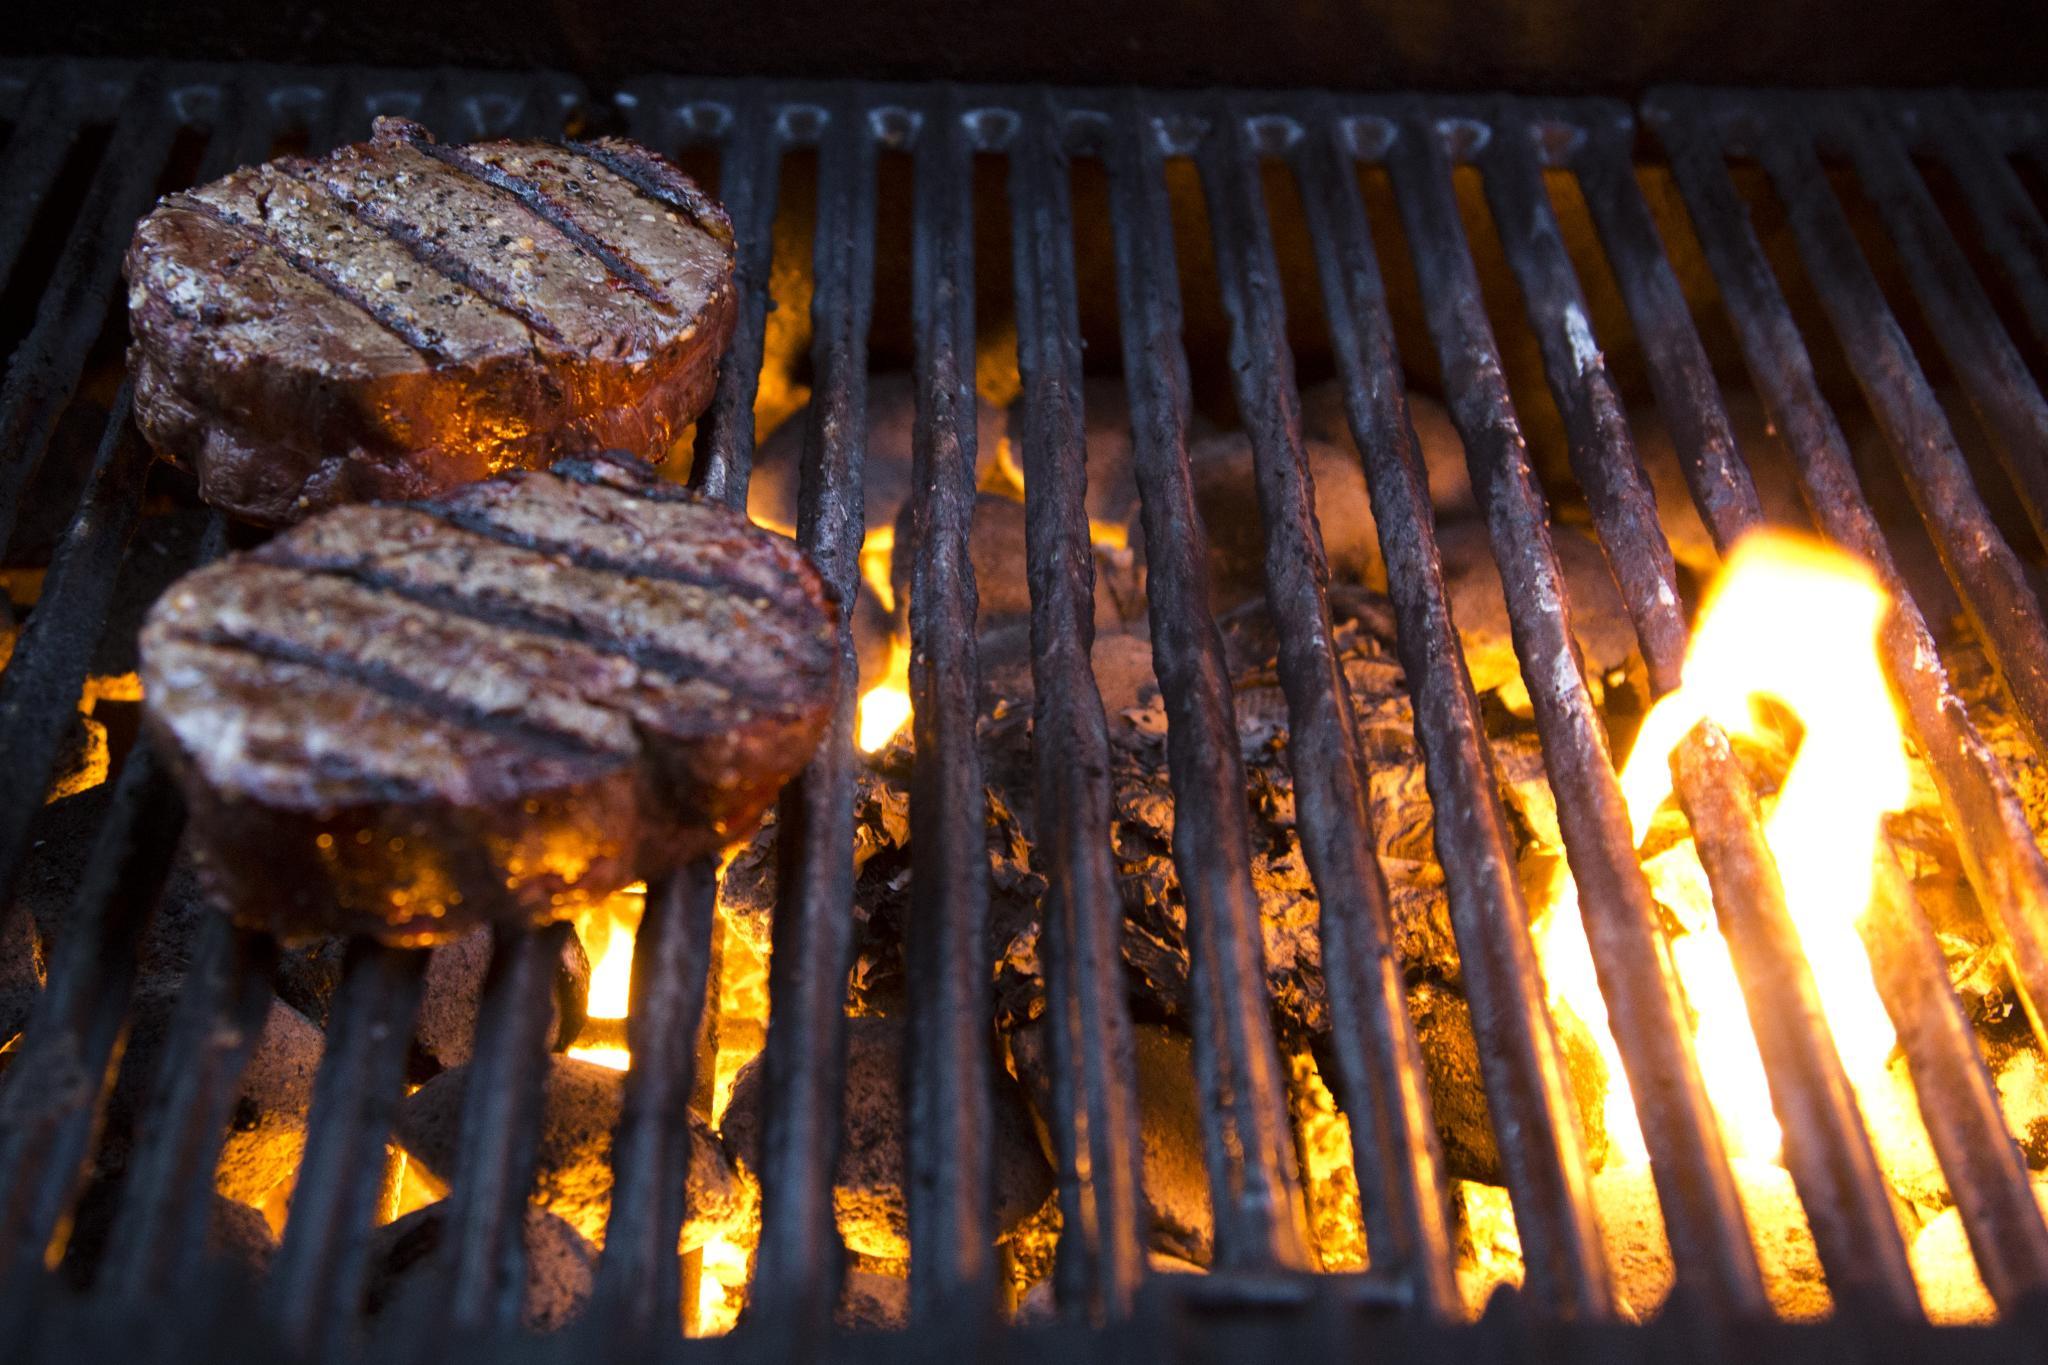 Filet Mignon grilled